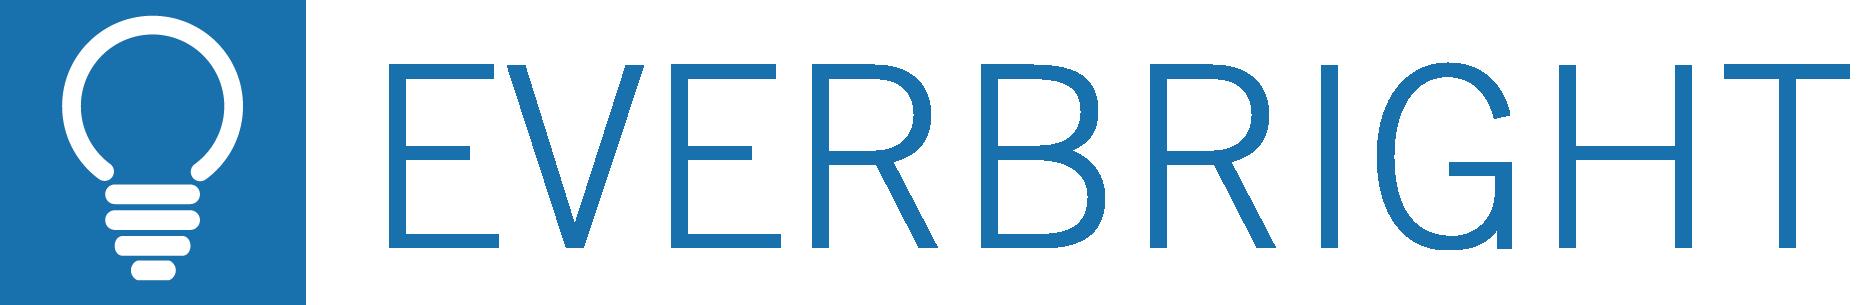 Everbright Lights Inc. Logo